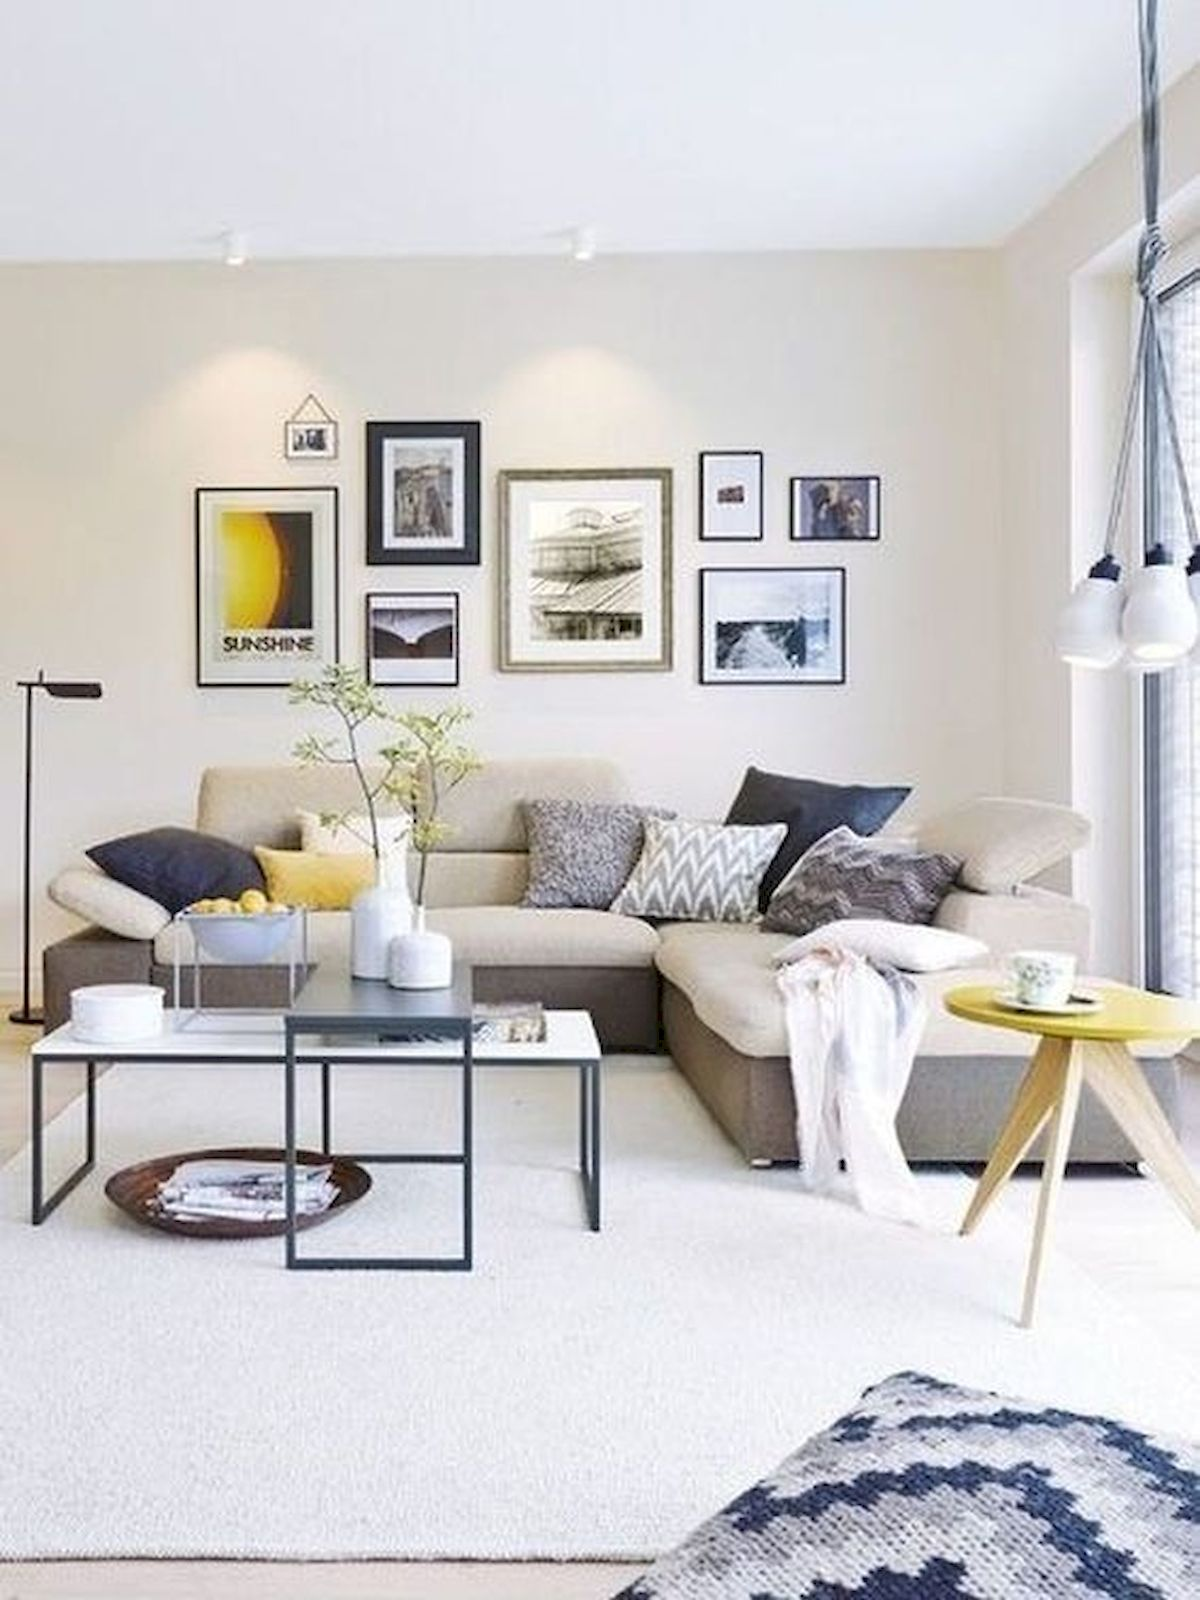 45 Brilliant DIY Living Room Design And Decor Ideas For Small Apartment (2)